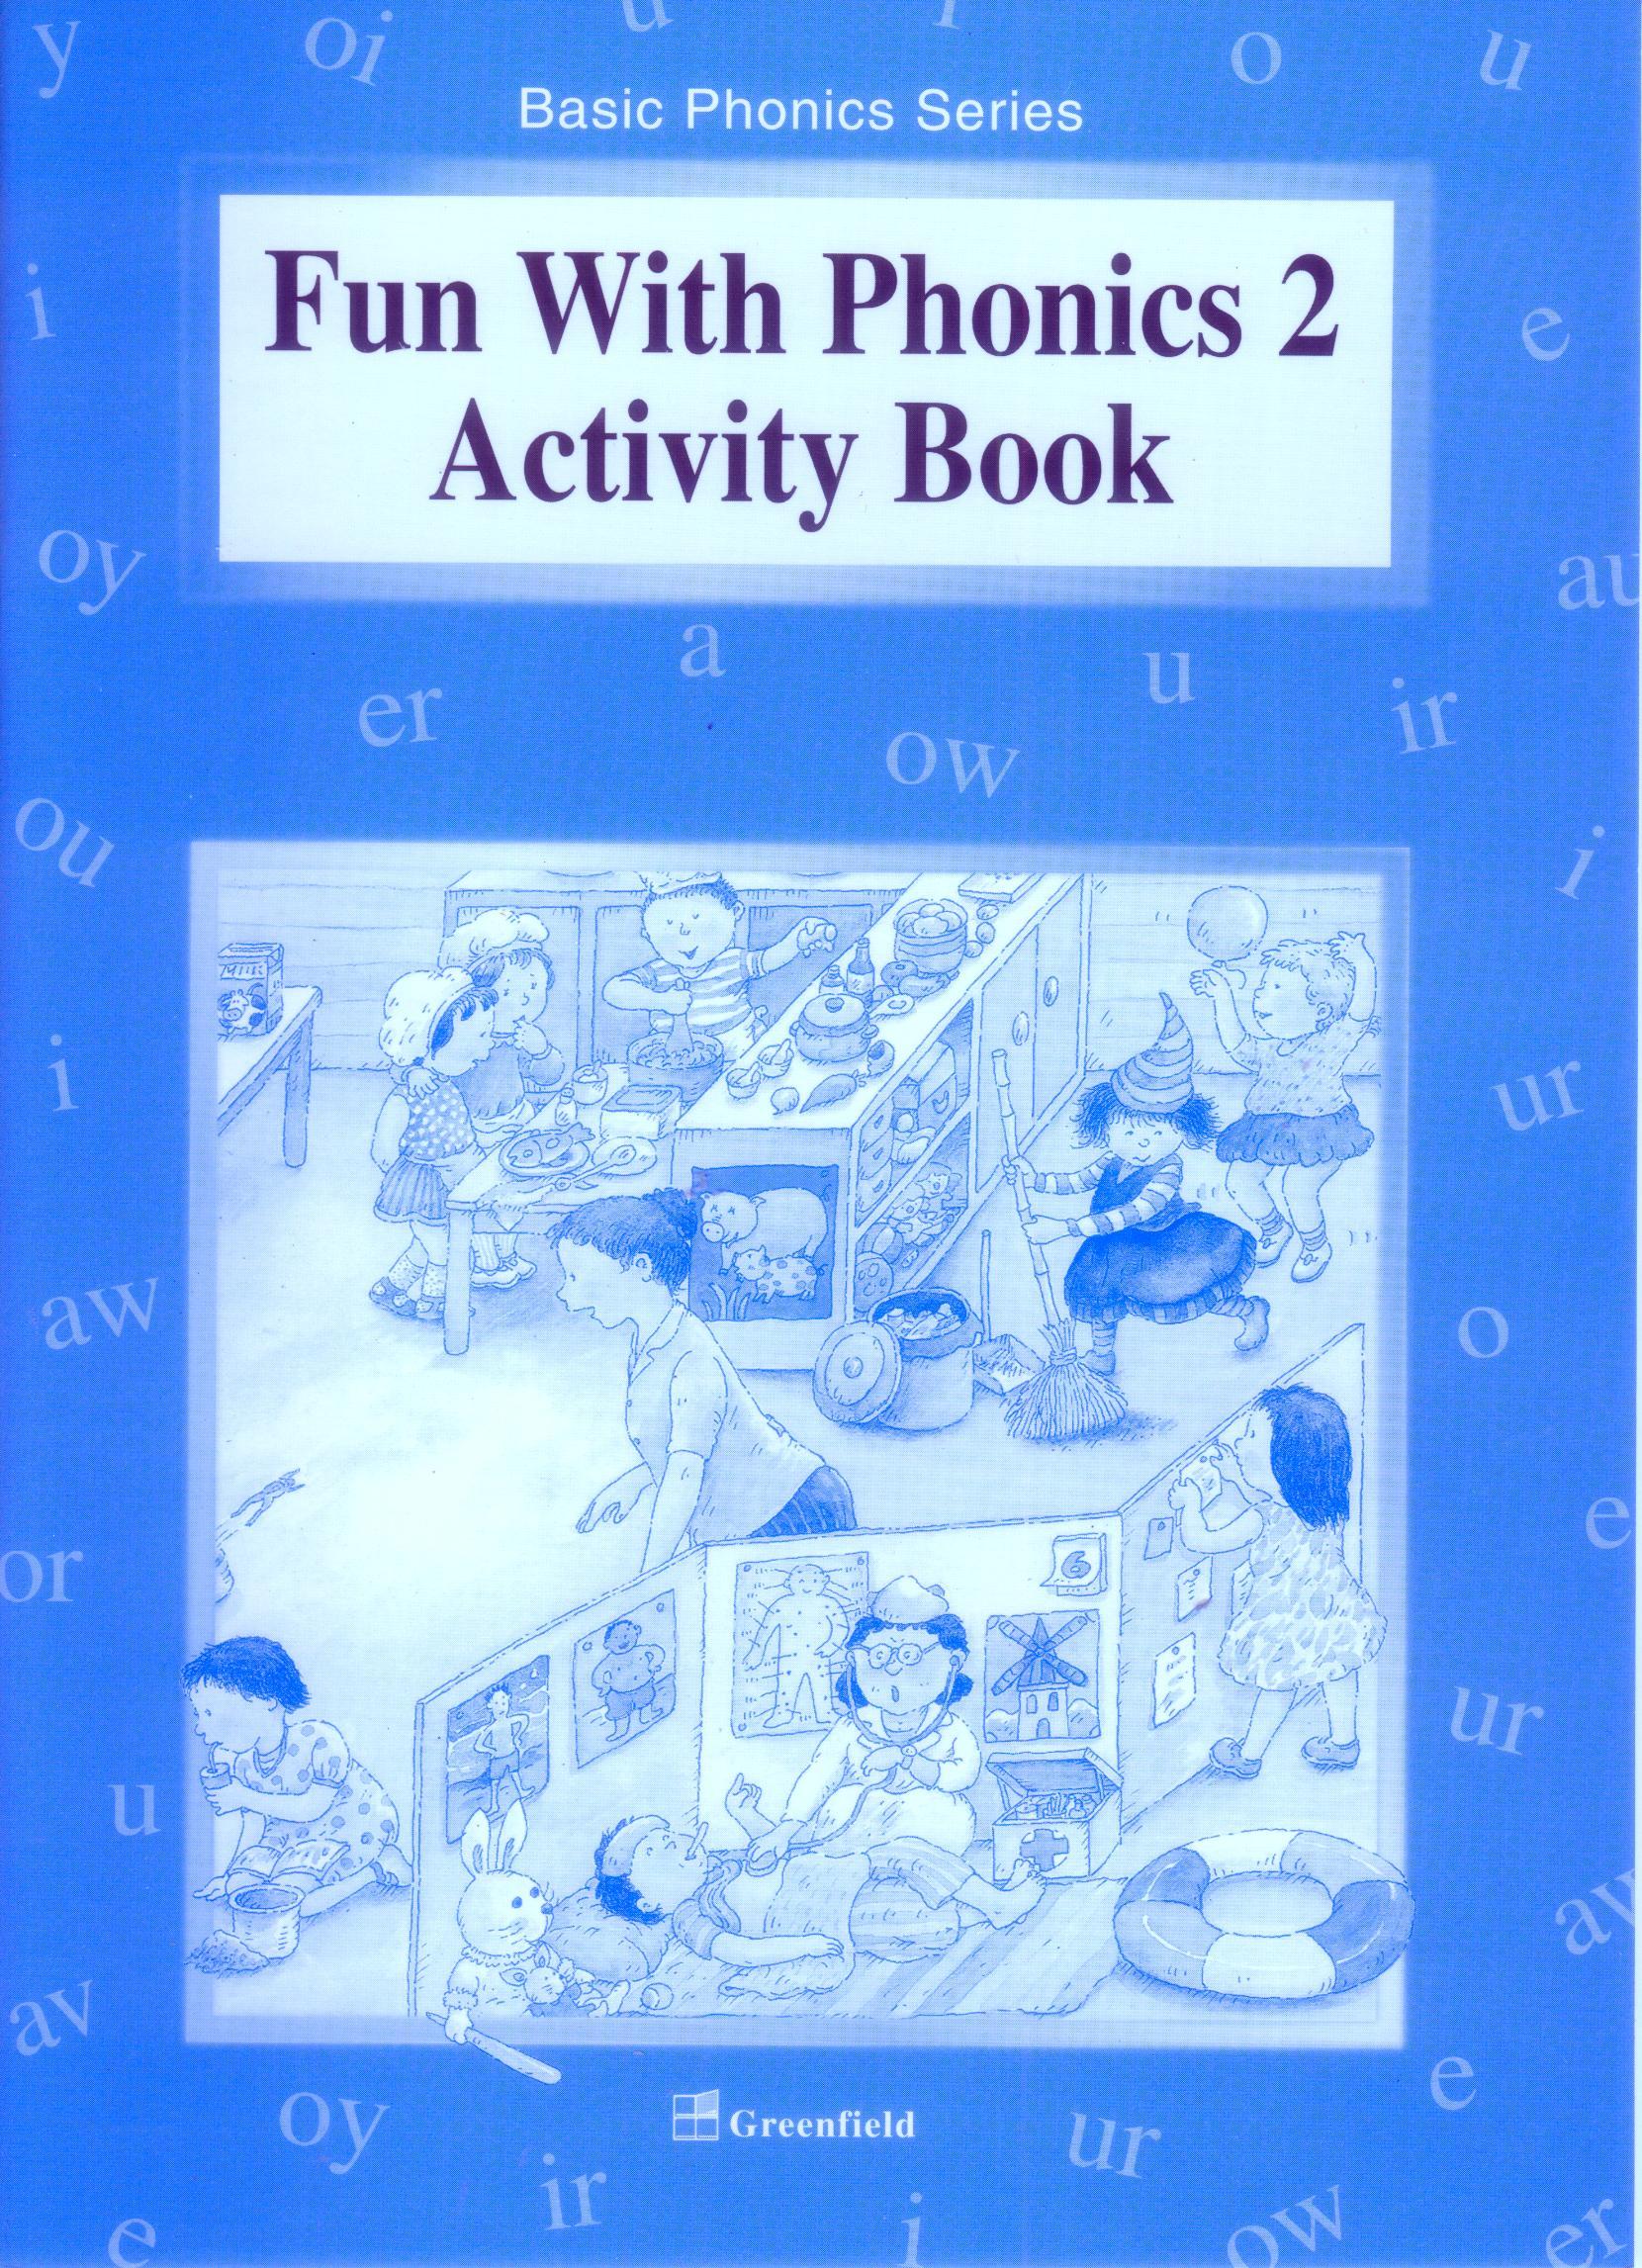 Fun With Phonics 2 Activity Book